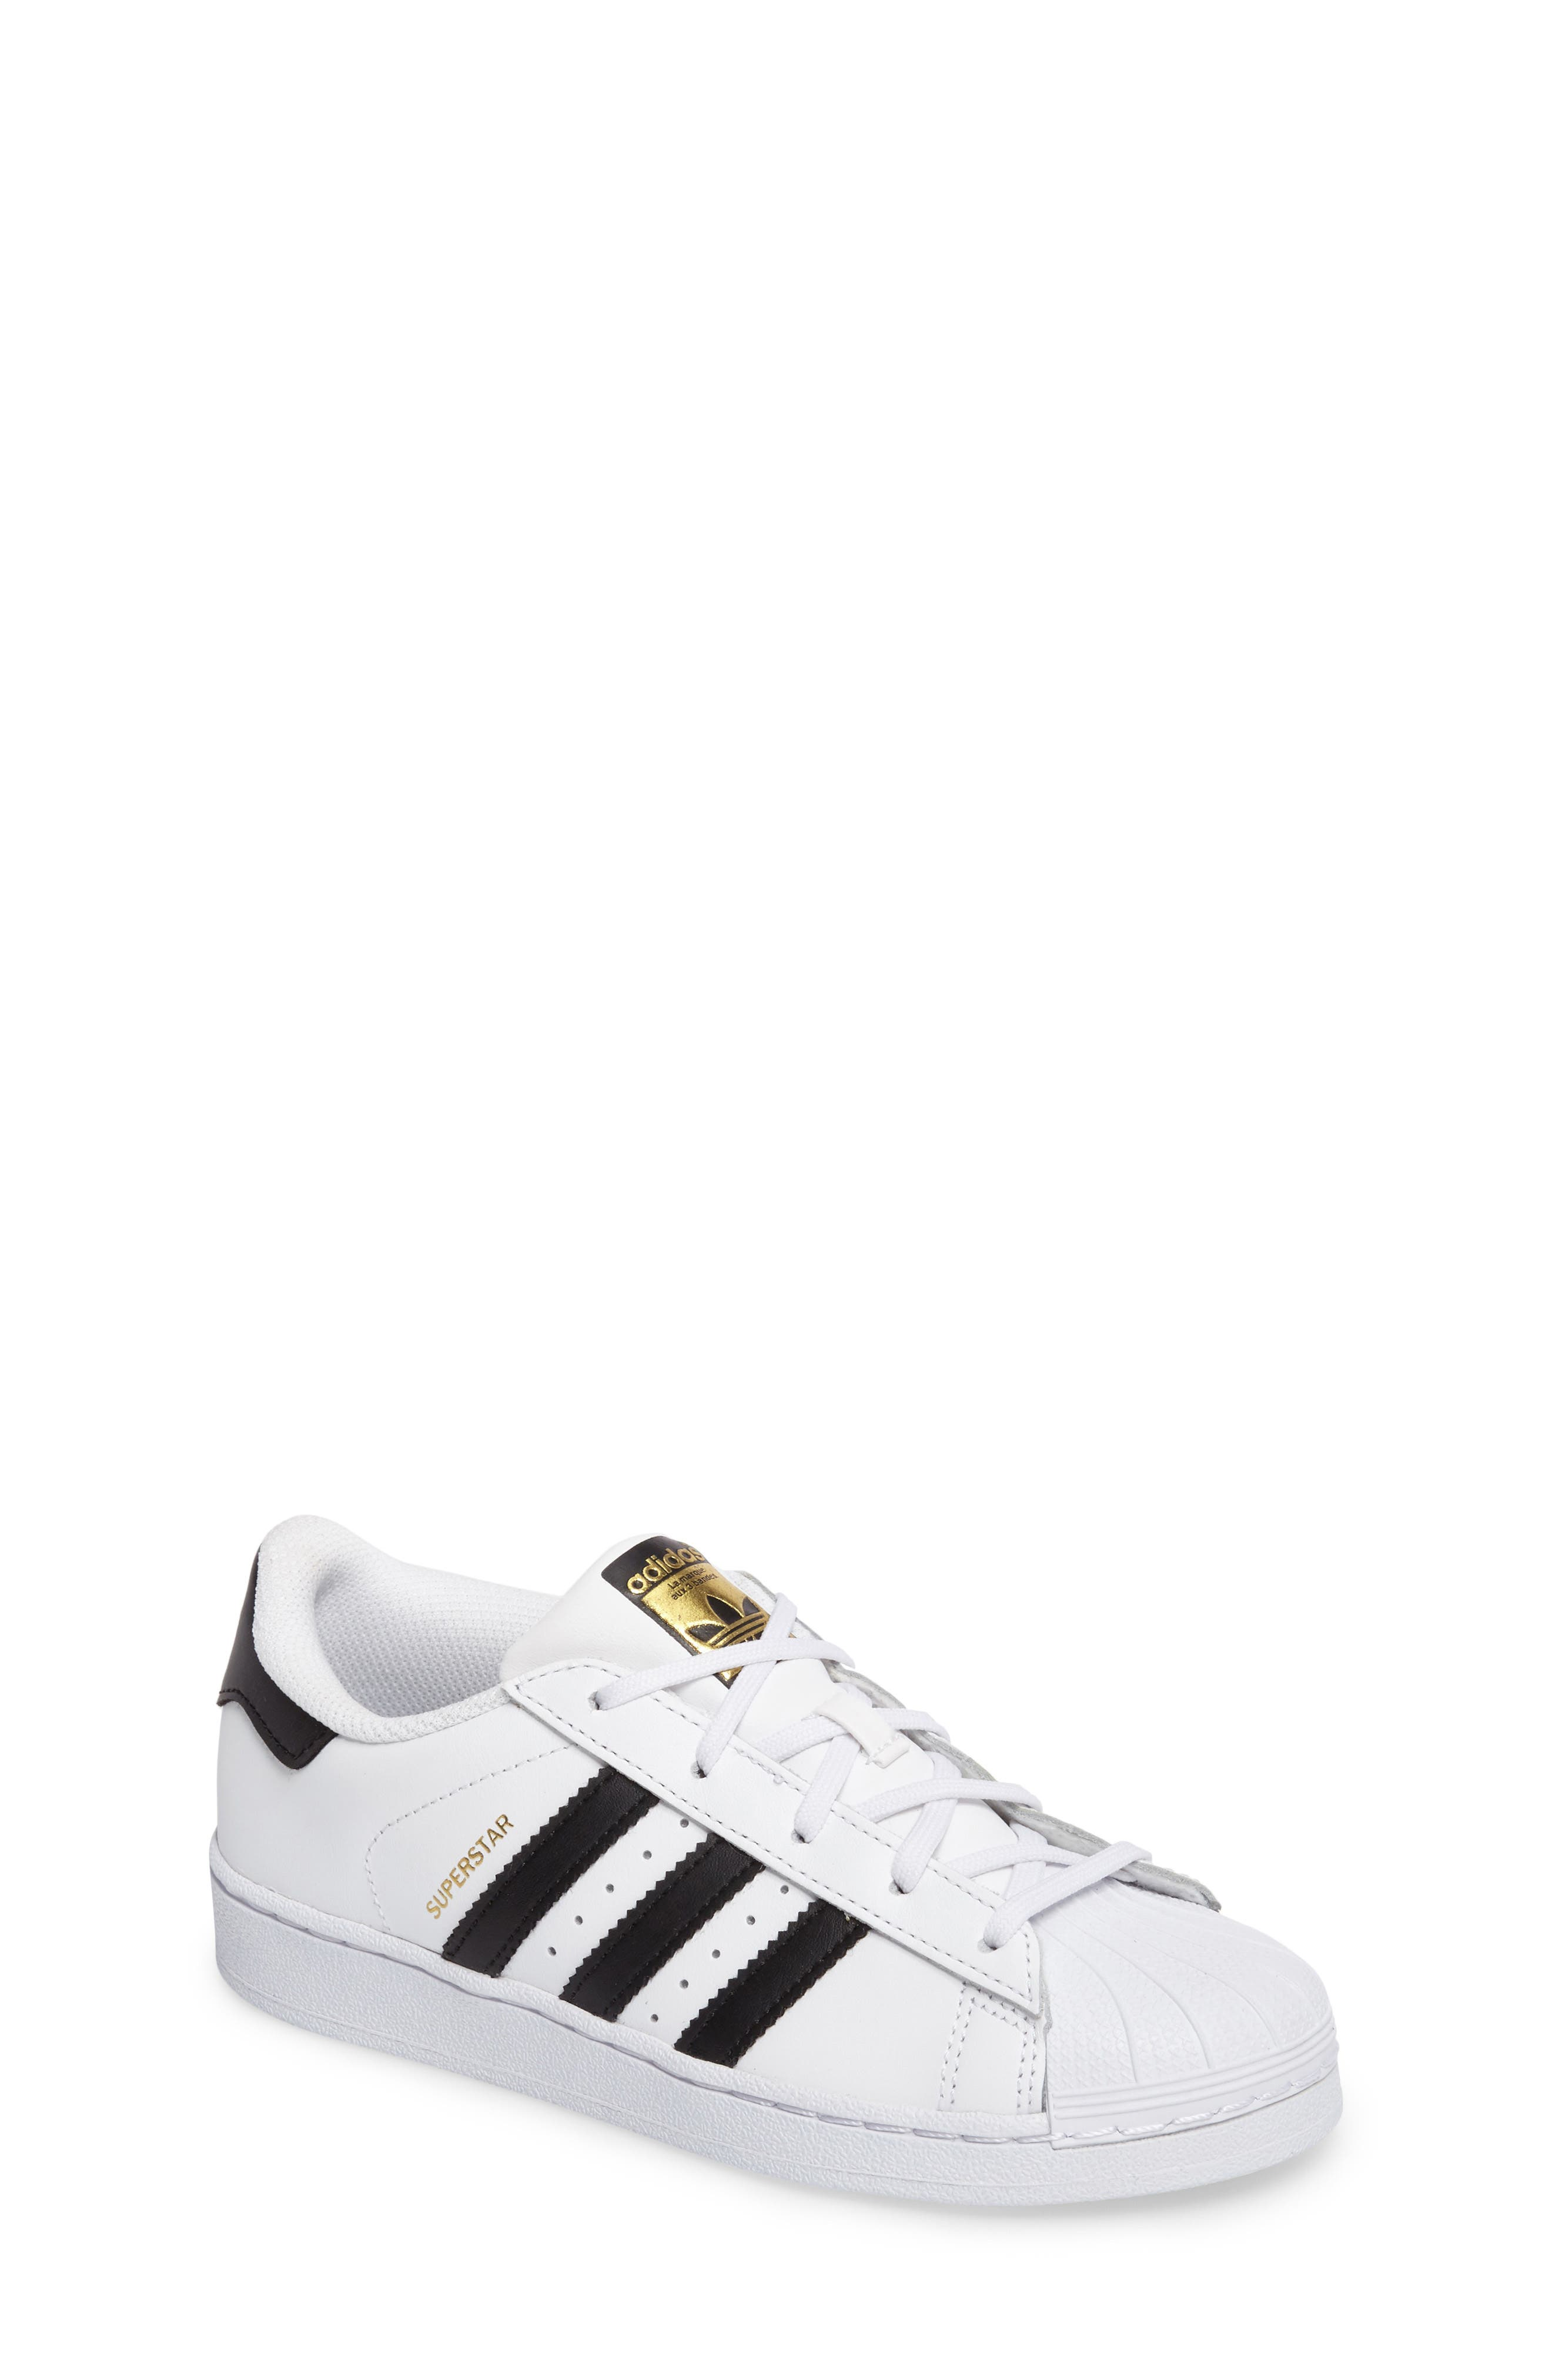 'Superstar Foundation' Sneaker,                             Main thumbnail 1, color,                             100